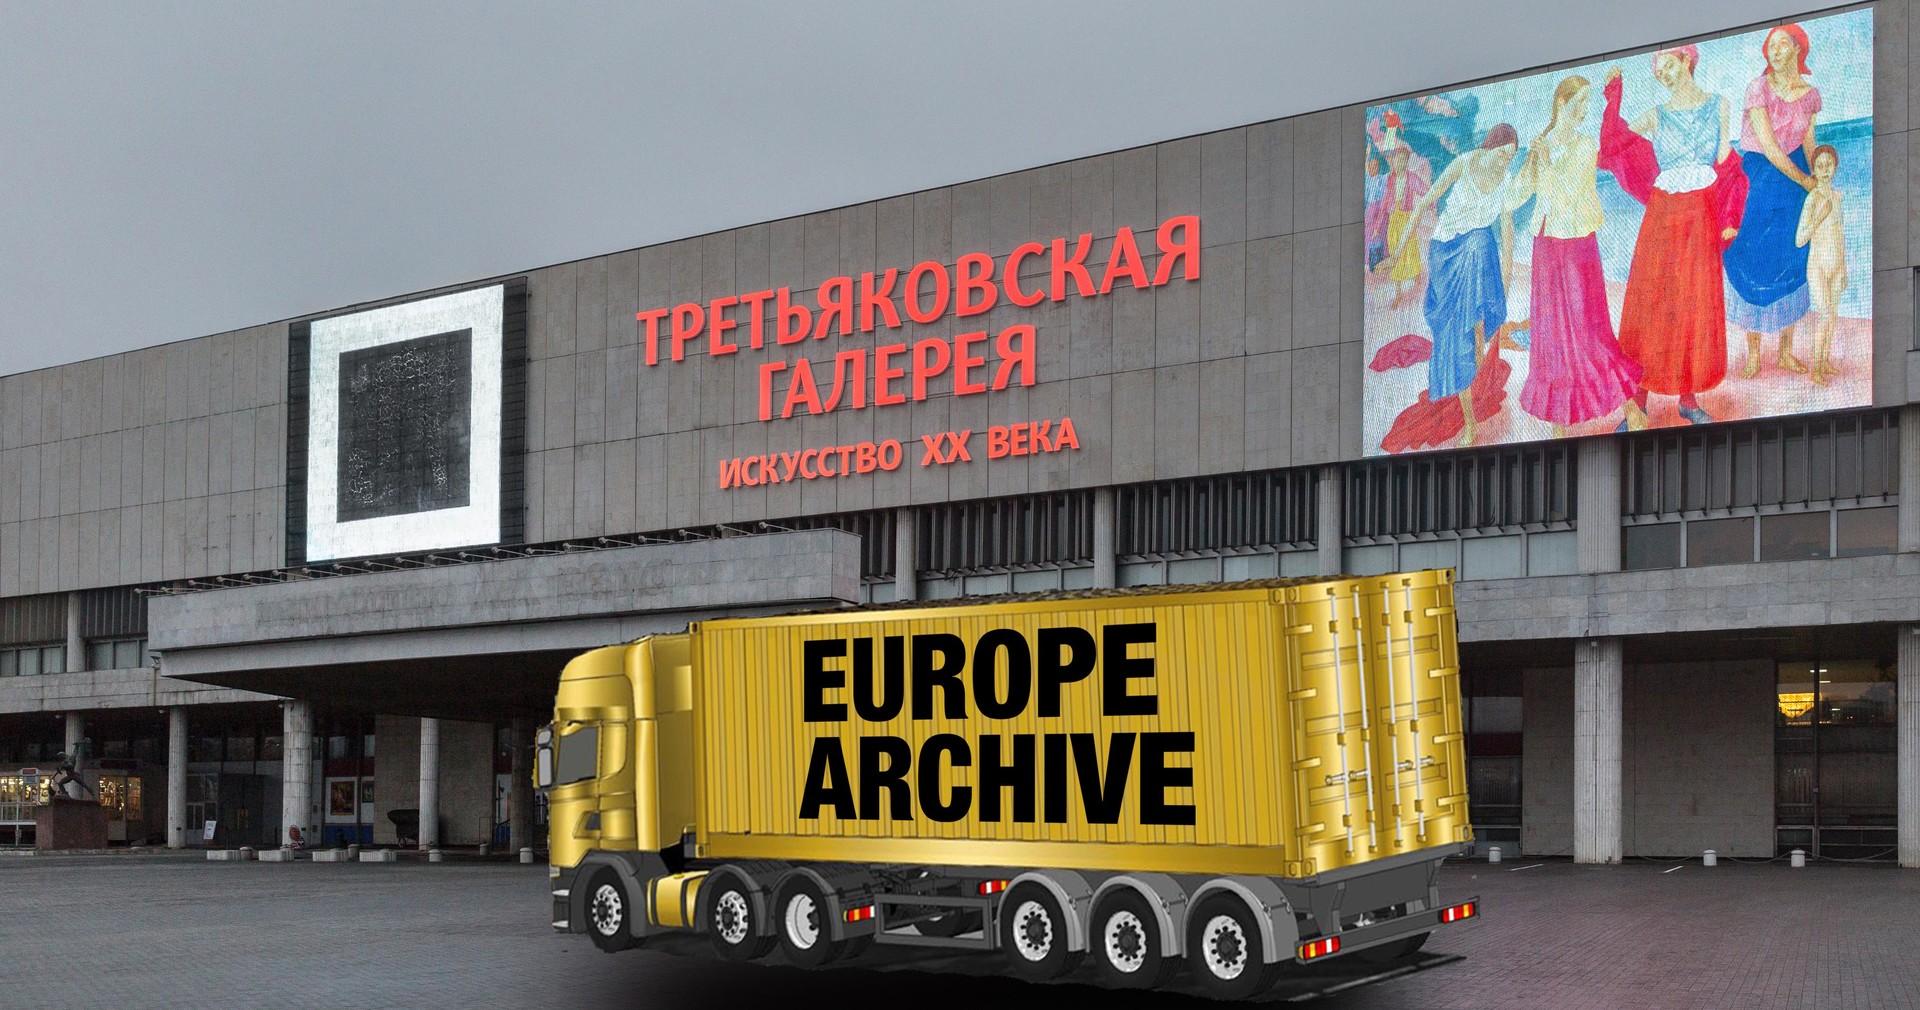 Erik Kessels & Thomas Mailaender, Europe Archive, 2020